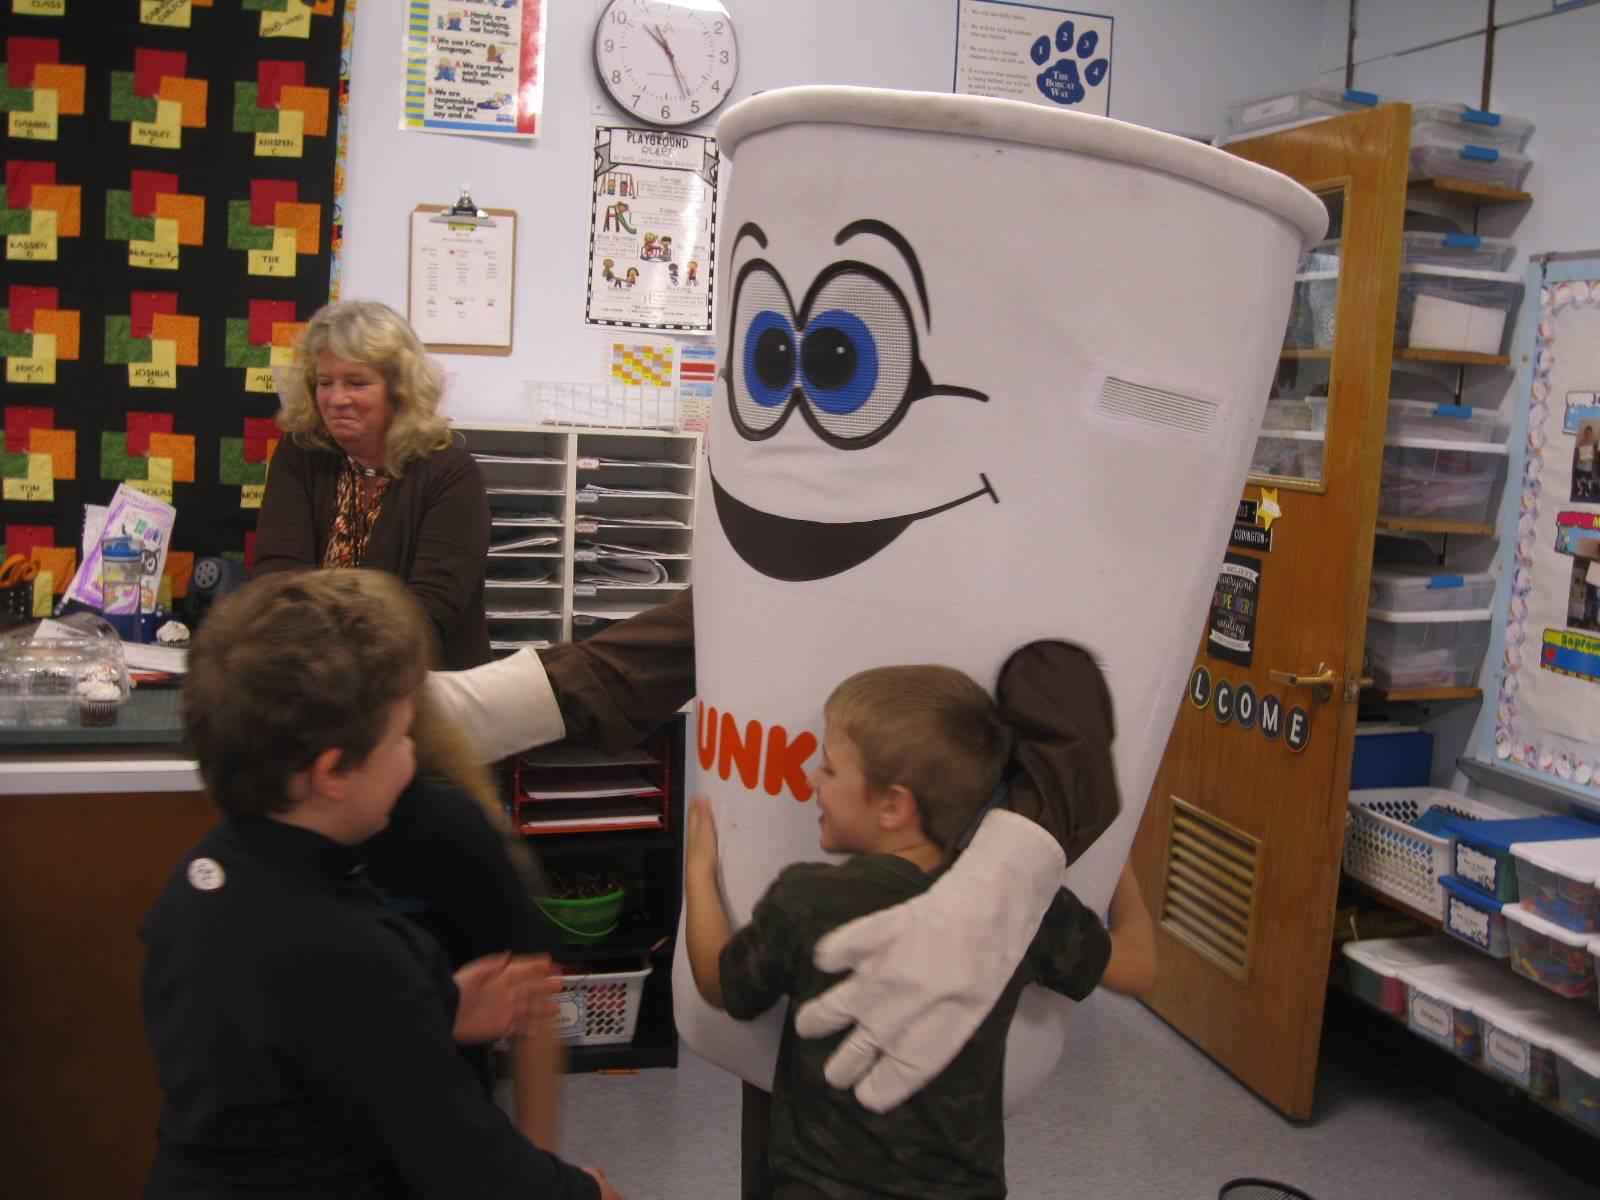 Dunkin donut man gives students hugs.